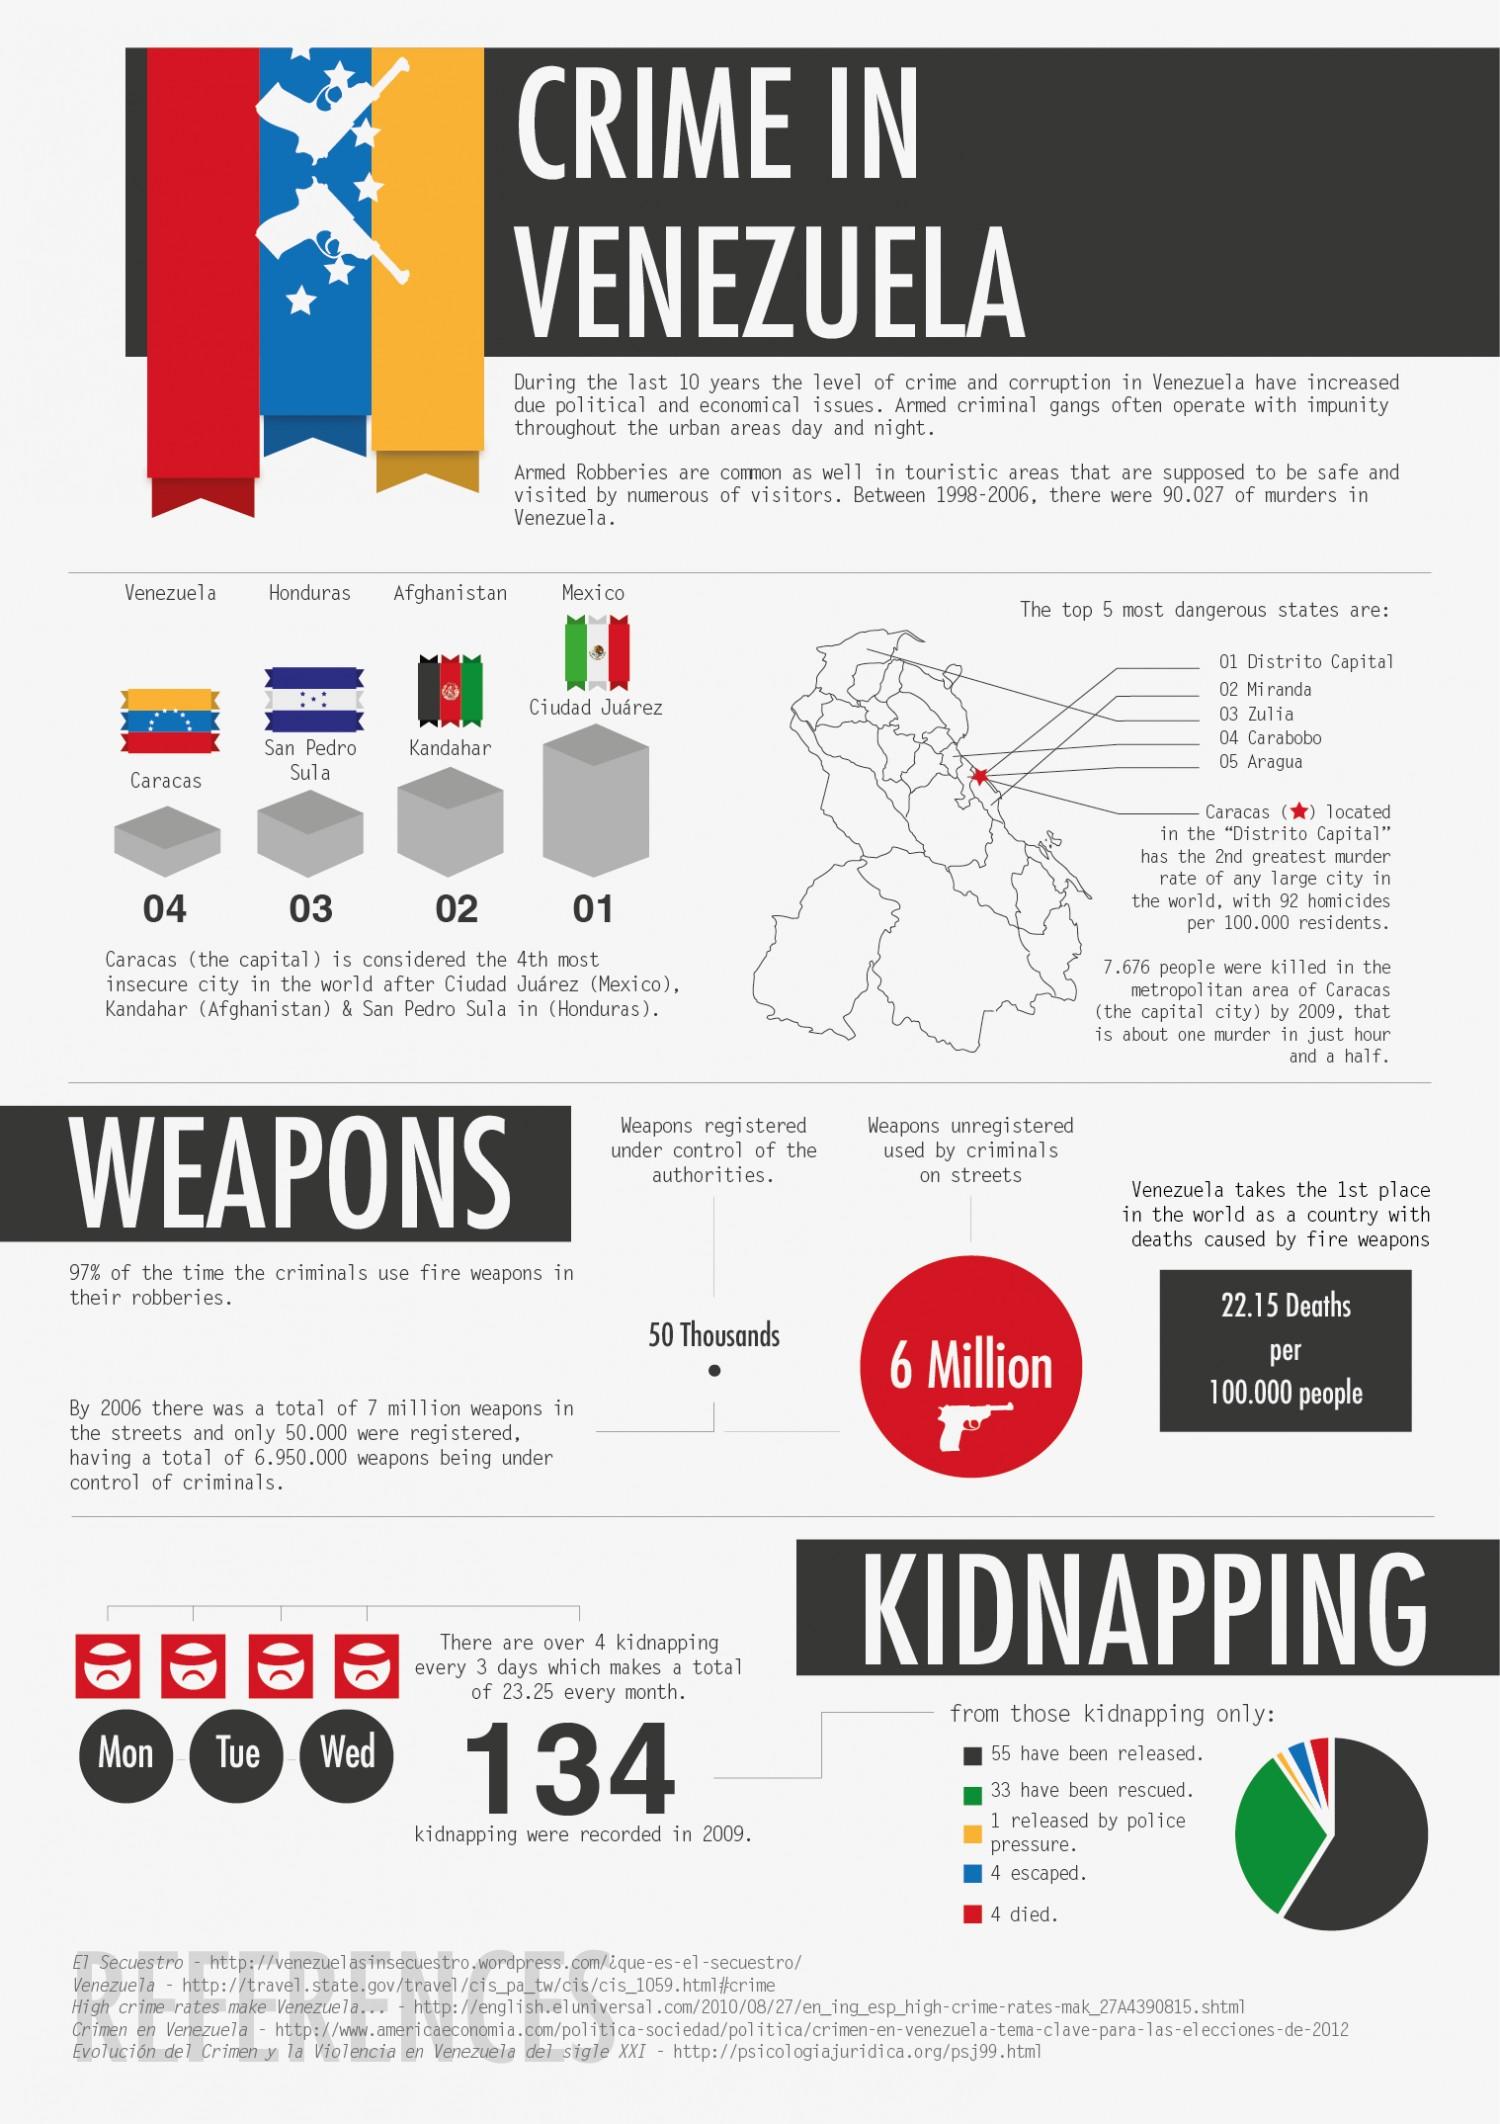 09 crime-in-venezuela_5076b15307614_w1500